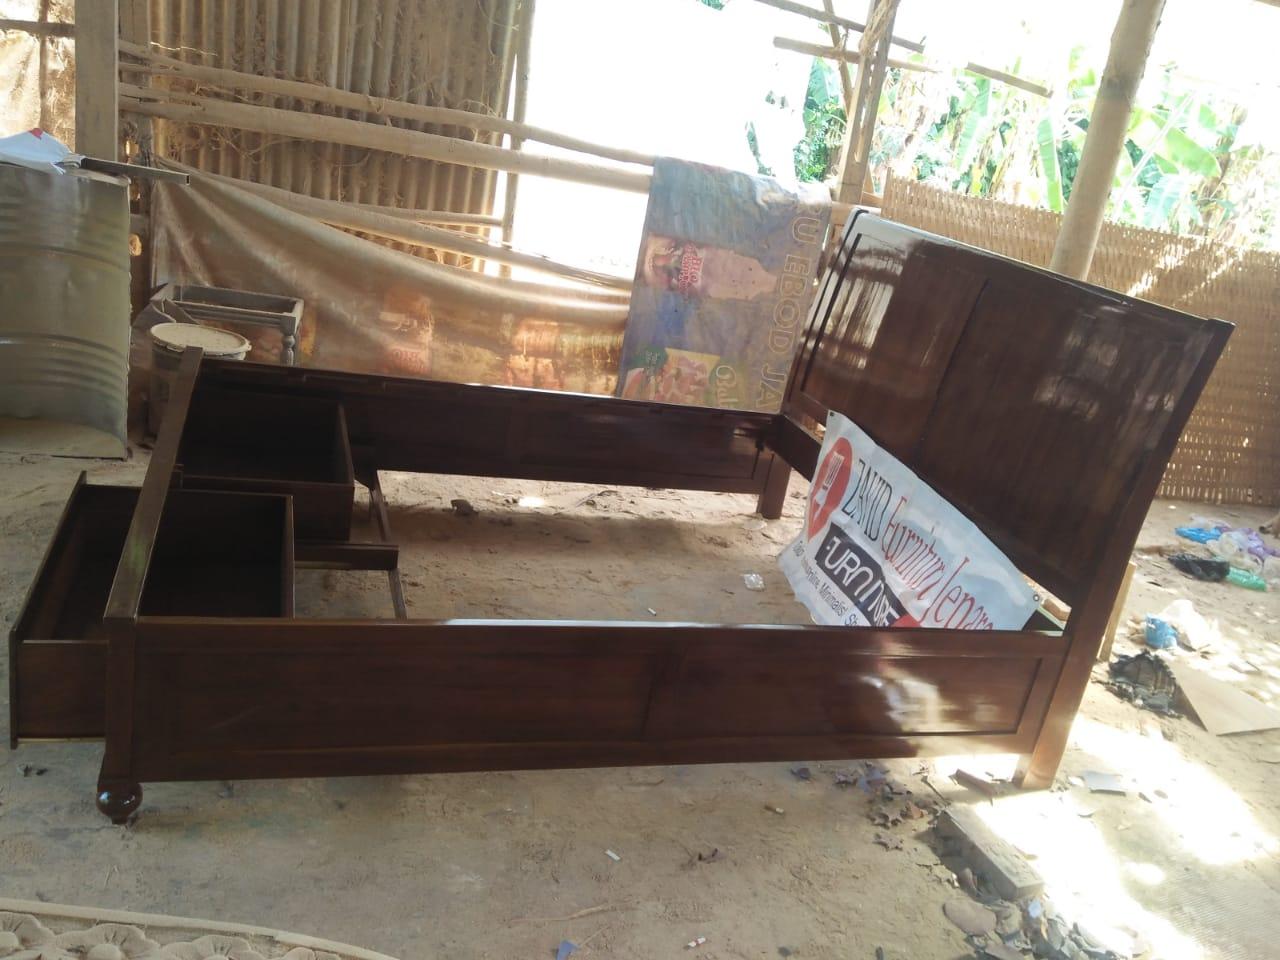 tempat-tidur-minimalis-kayu-jati-dua-laci-bawah Tempat Tidur Madiun Minimalis Kayu Jati 2 Laci